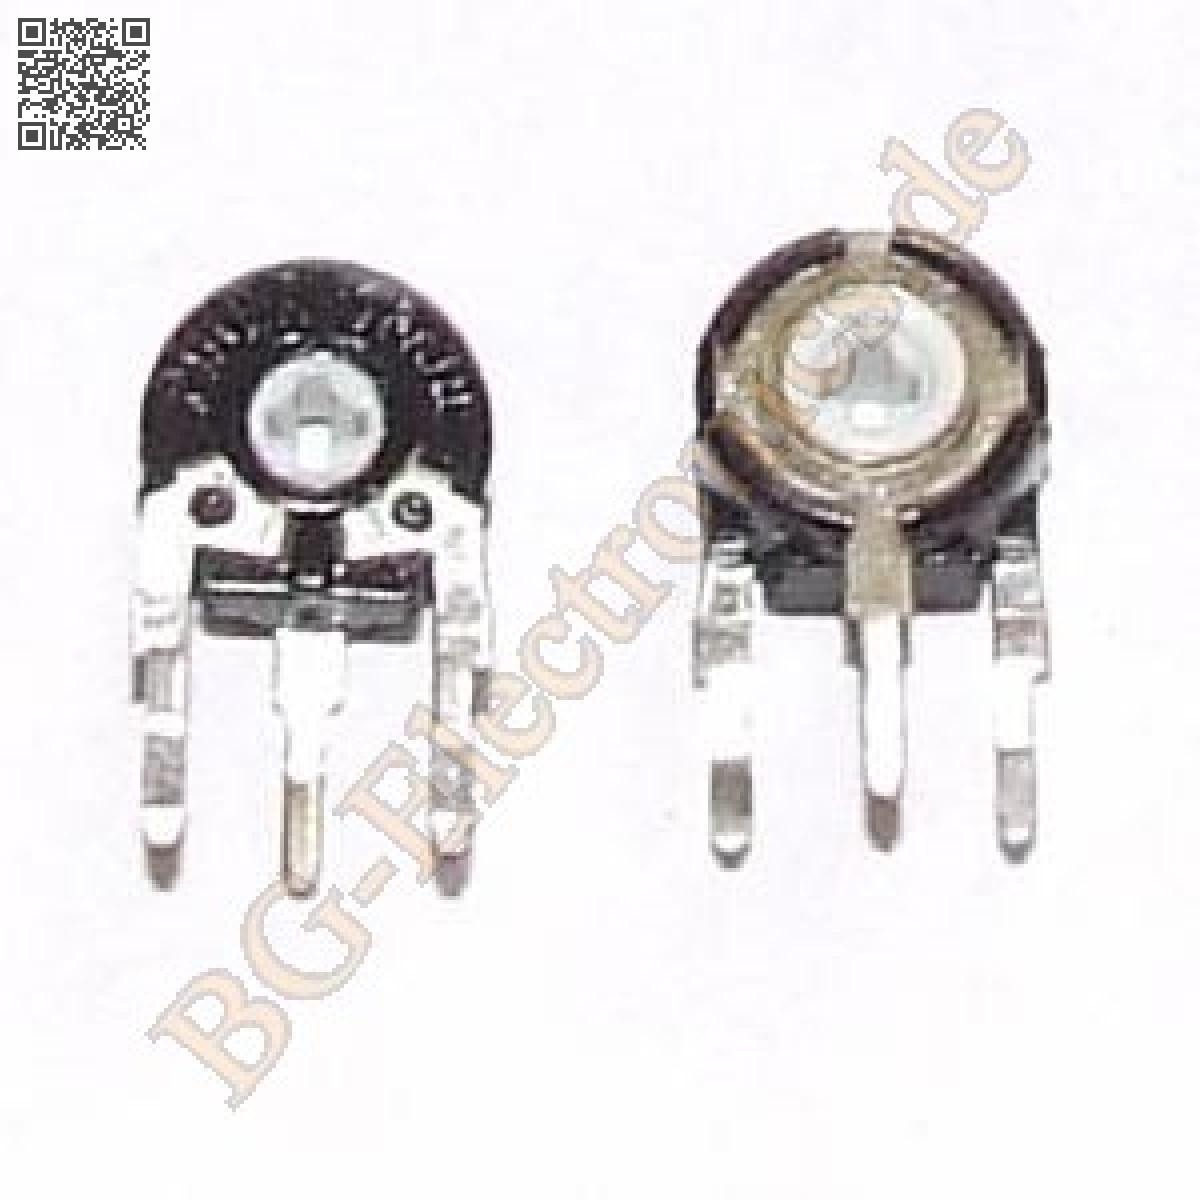 Lm380n Bg Electronics Lm380 25 Watt Amplifier Trimmer 22 K Stehend Piher